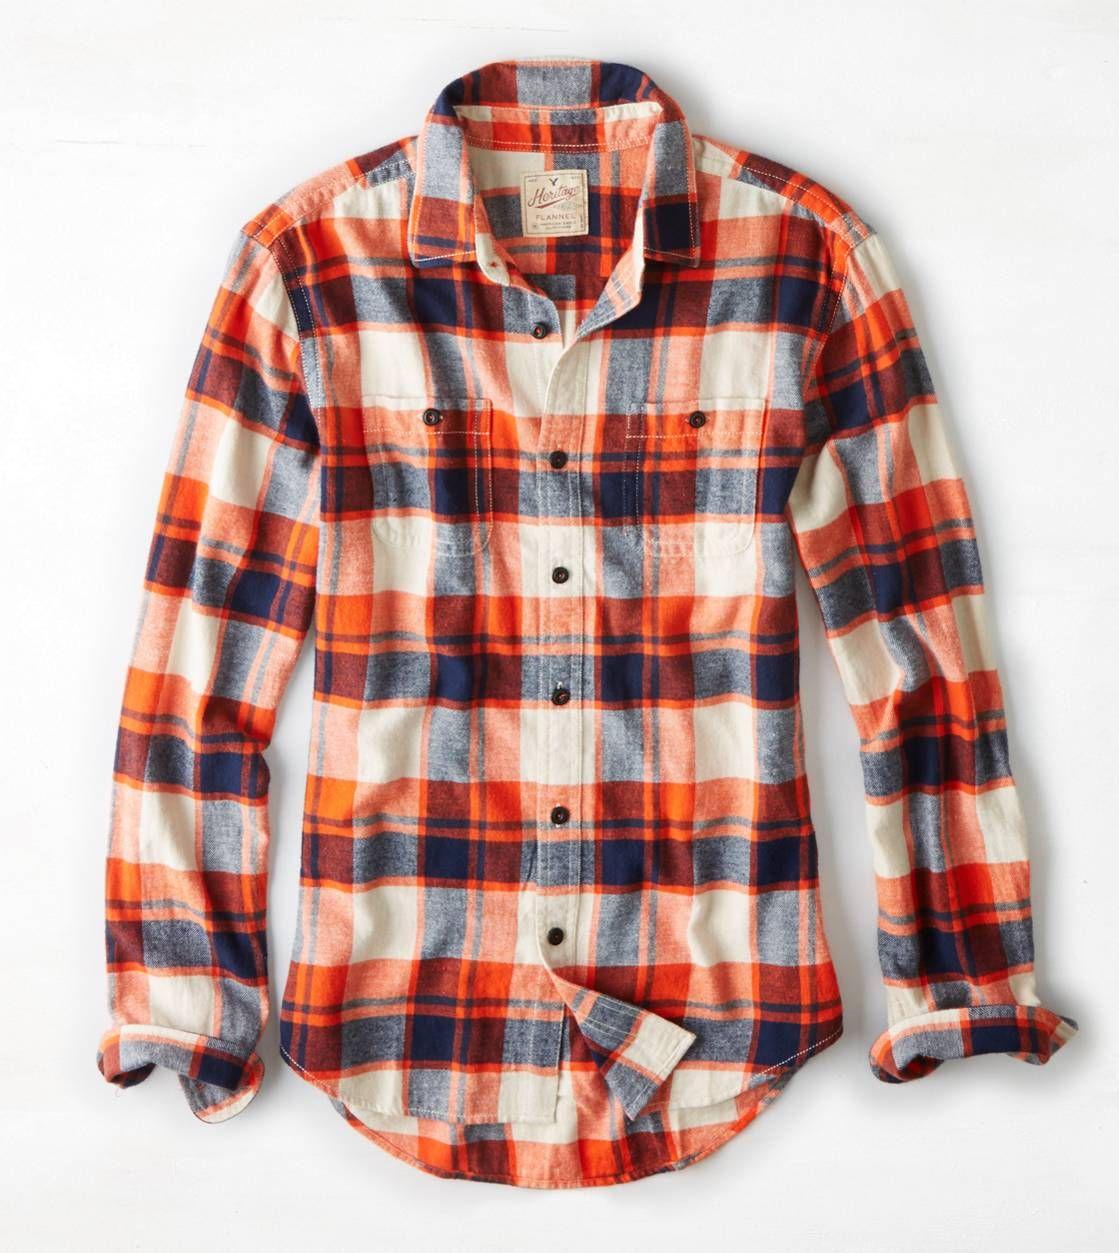 Orange flannel jacket  AEO Heritage Flannel  My Pinterest Closet  Pinterest  Aeo and